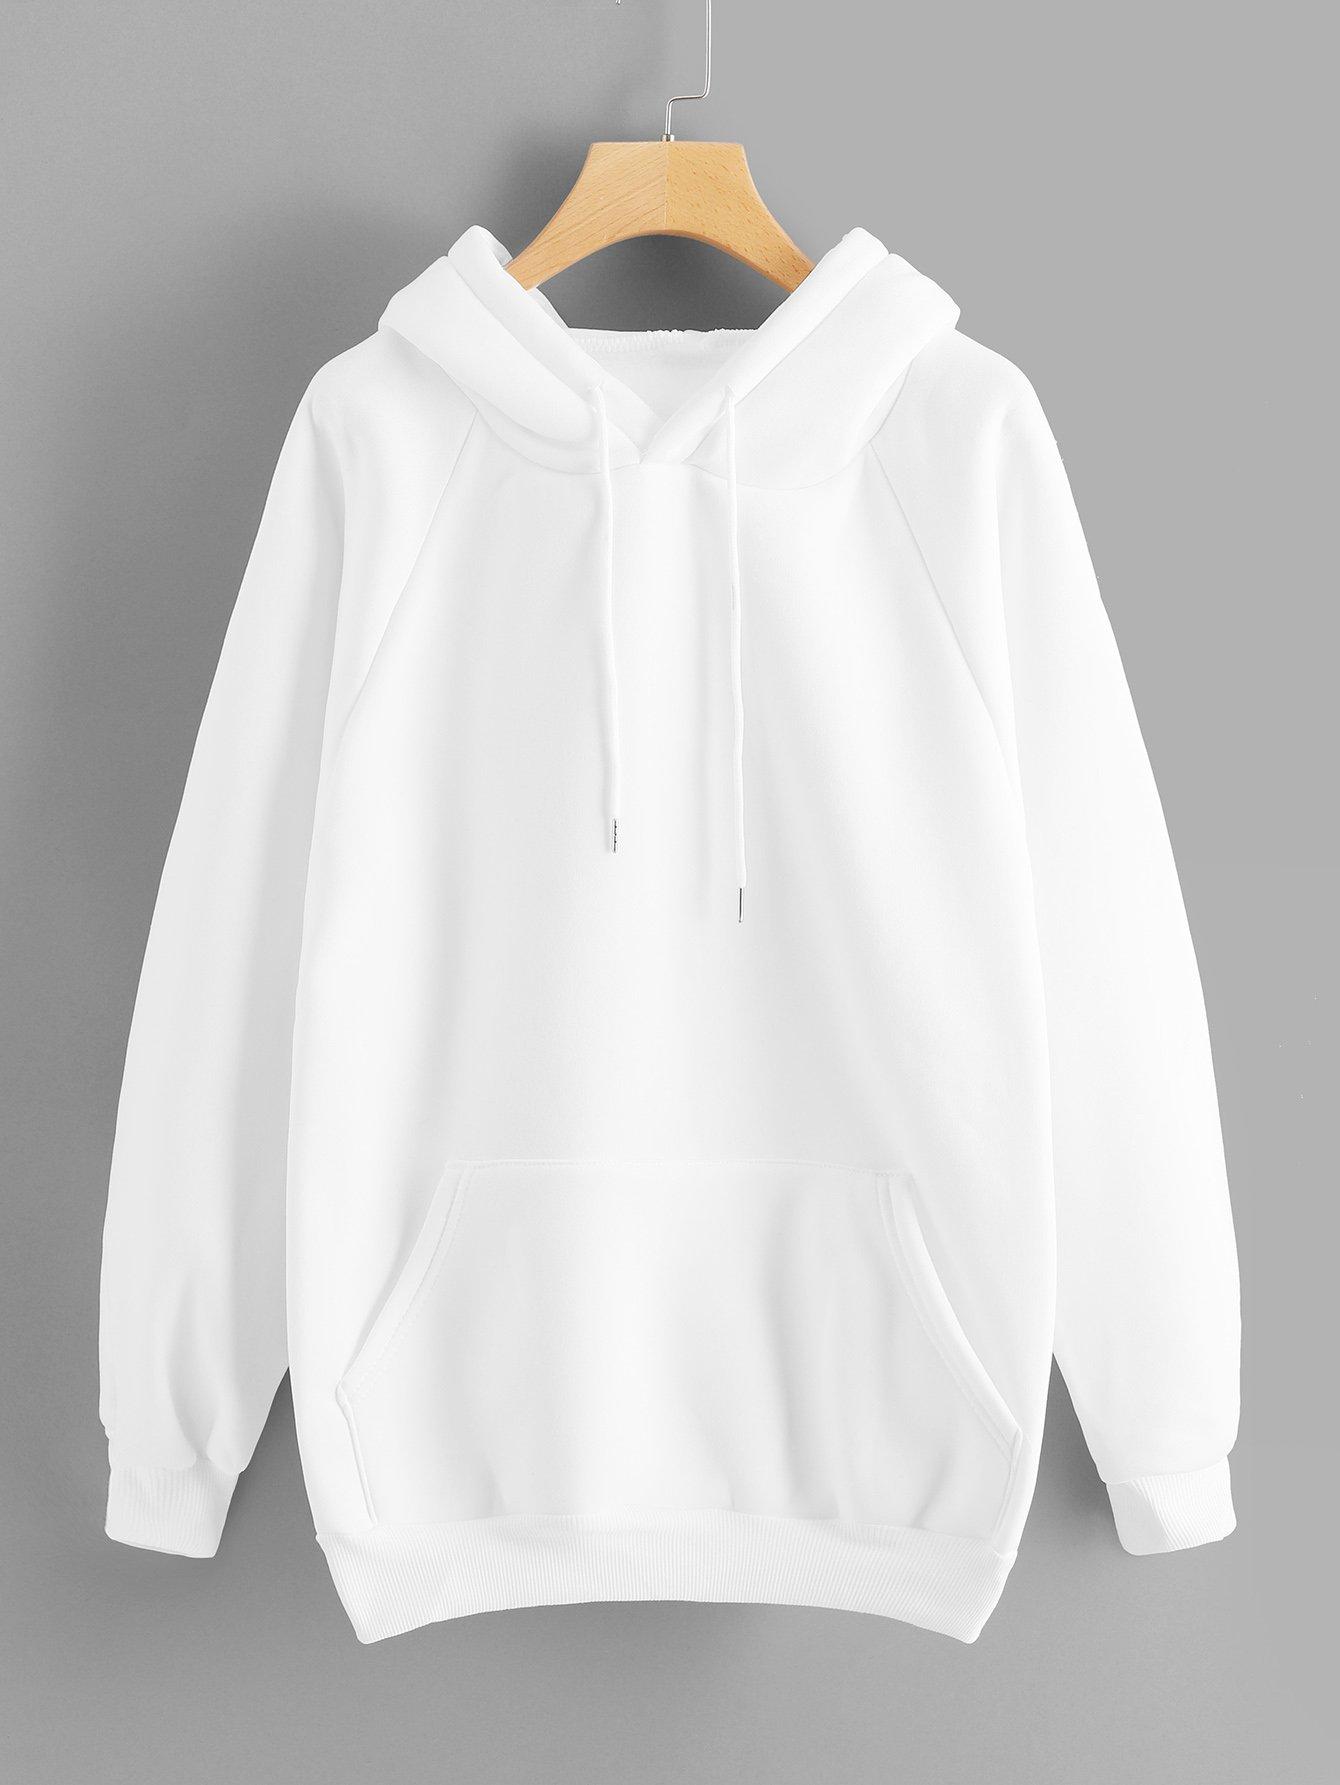 Фото - Толстовку с карманами и рукав-регланами от SheIn белого цвета